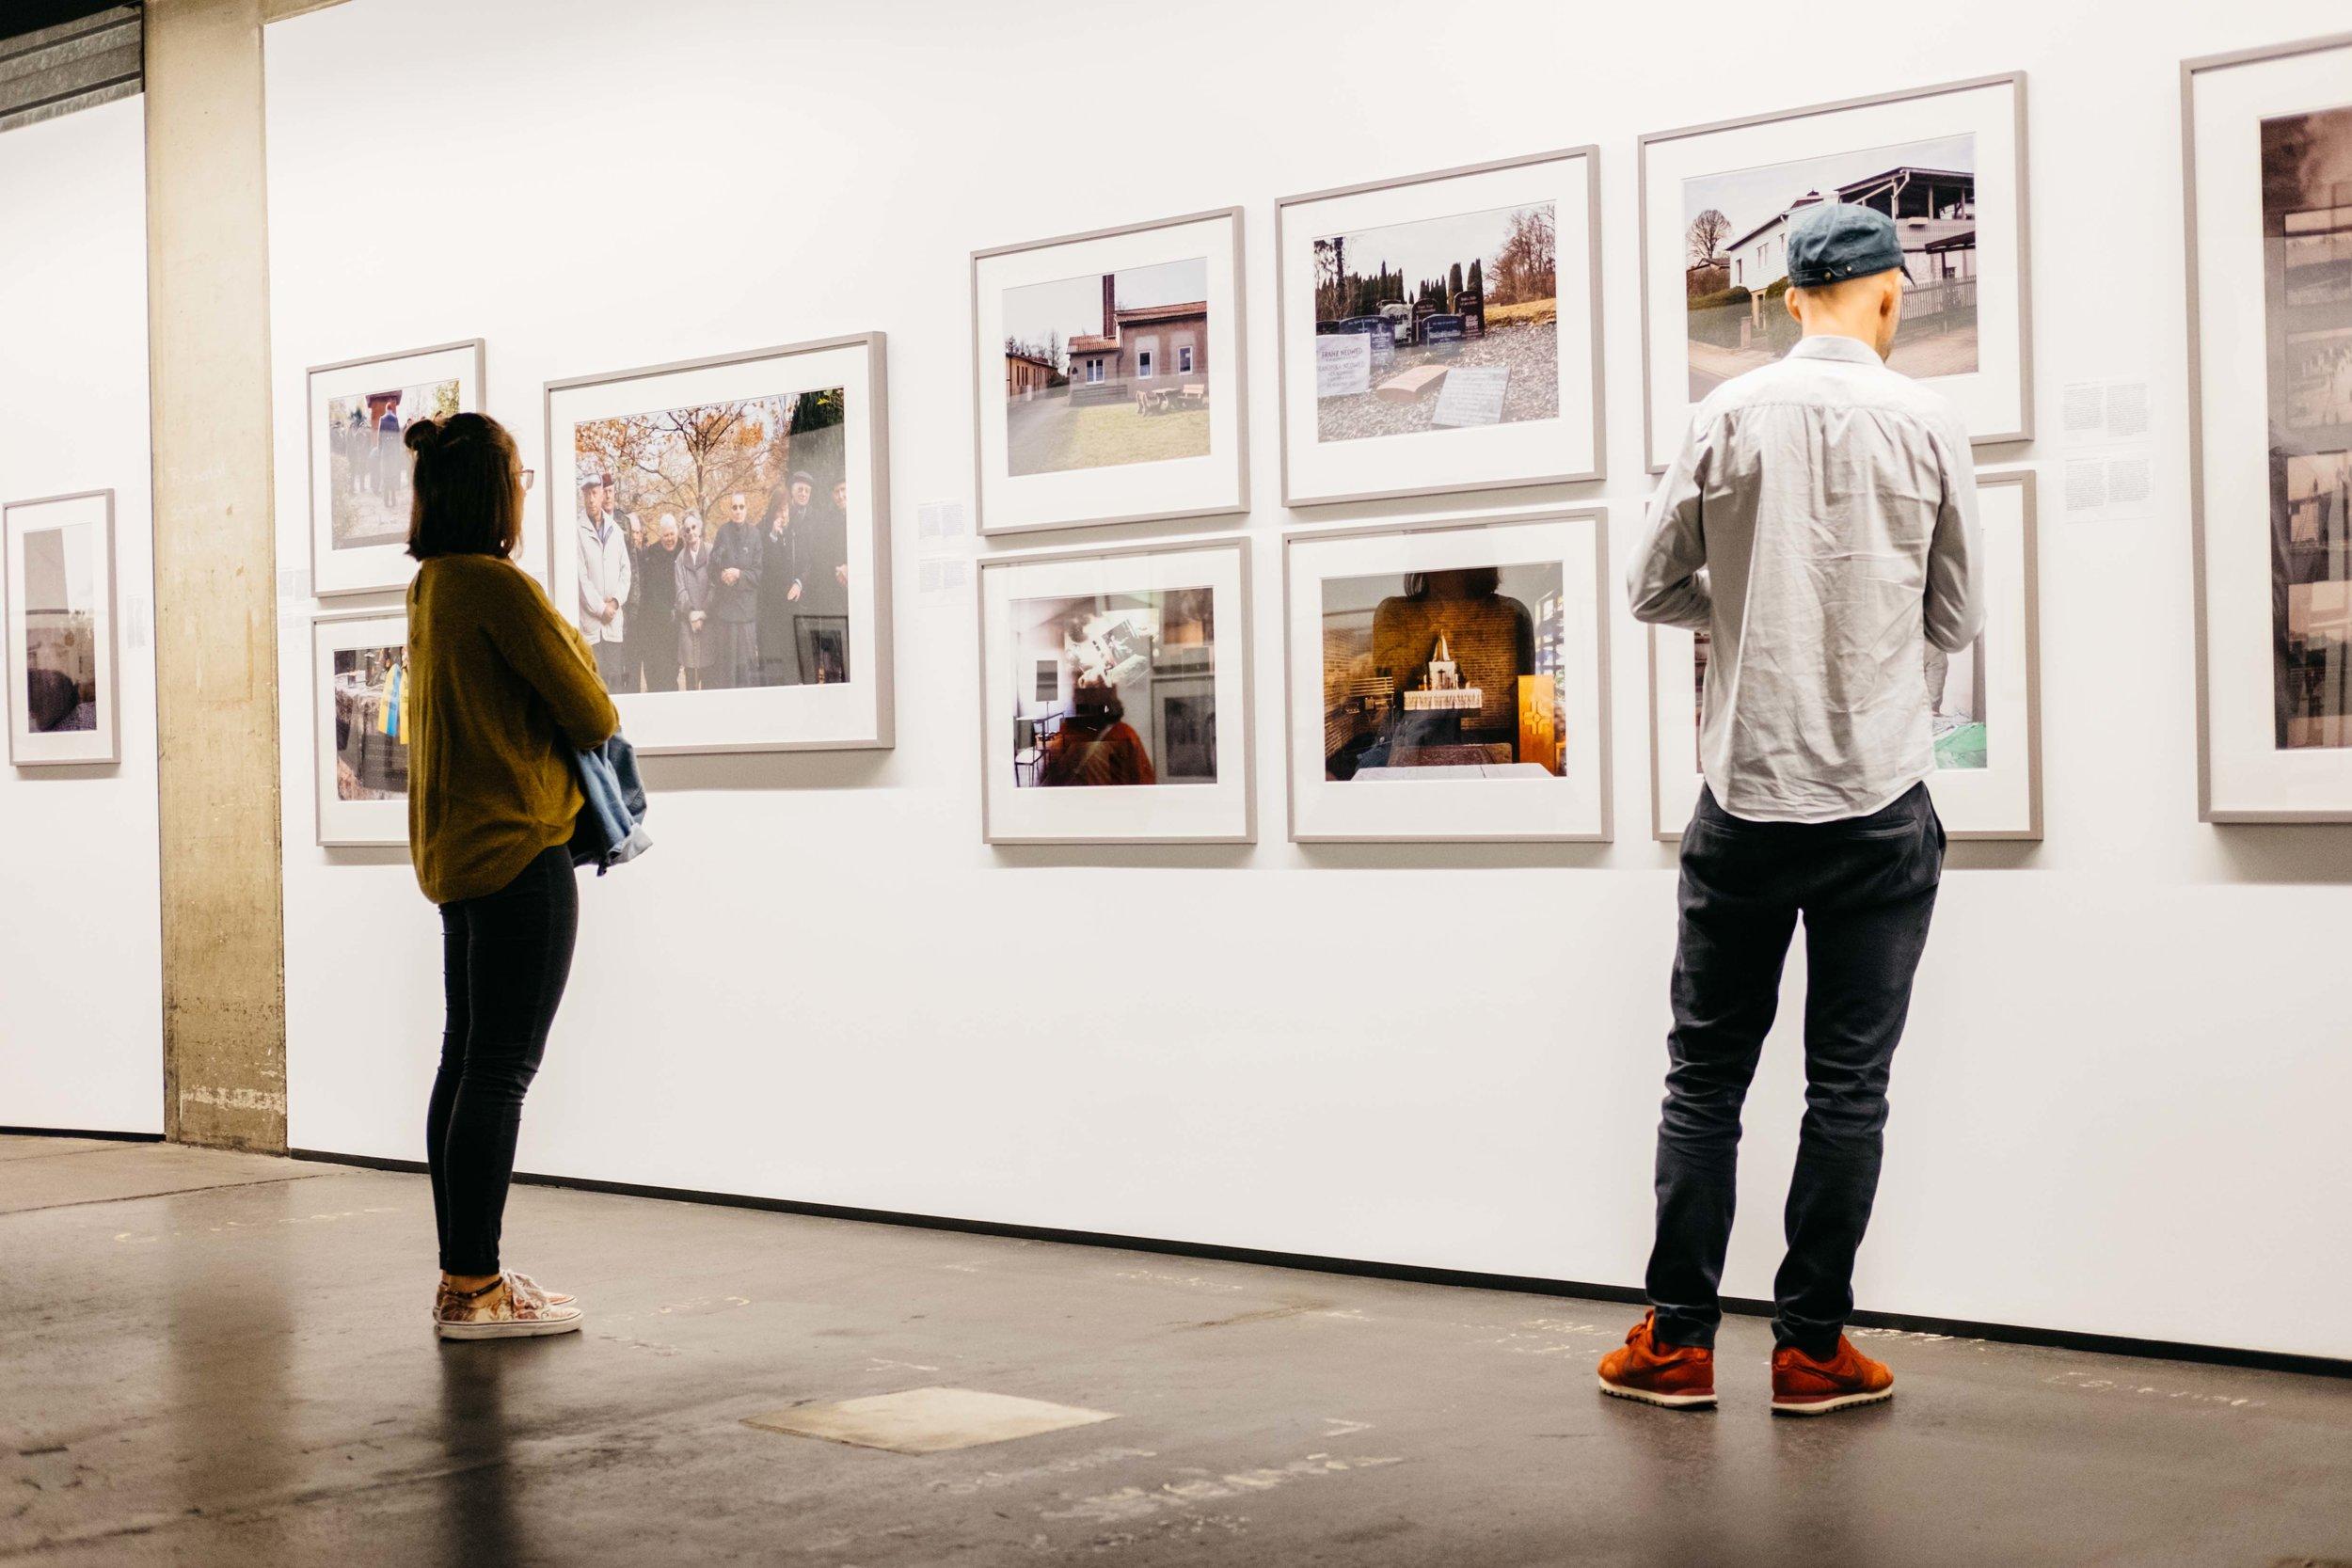 documenta14-kassel-kunst-wearecity-simonhariman-2017-28.jpg